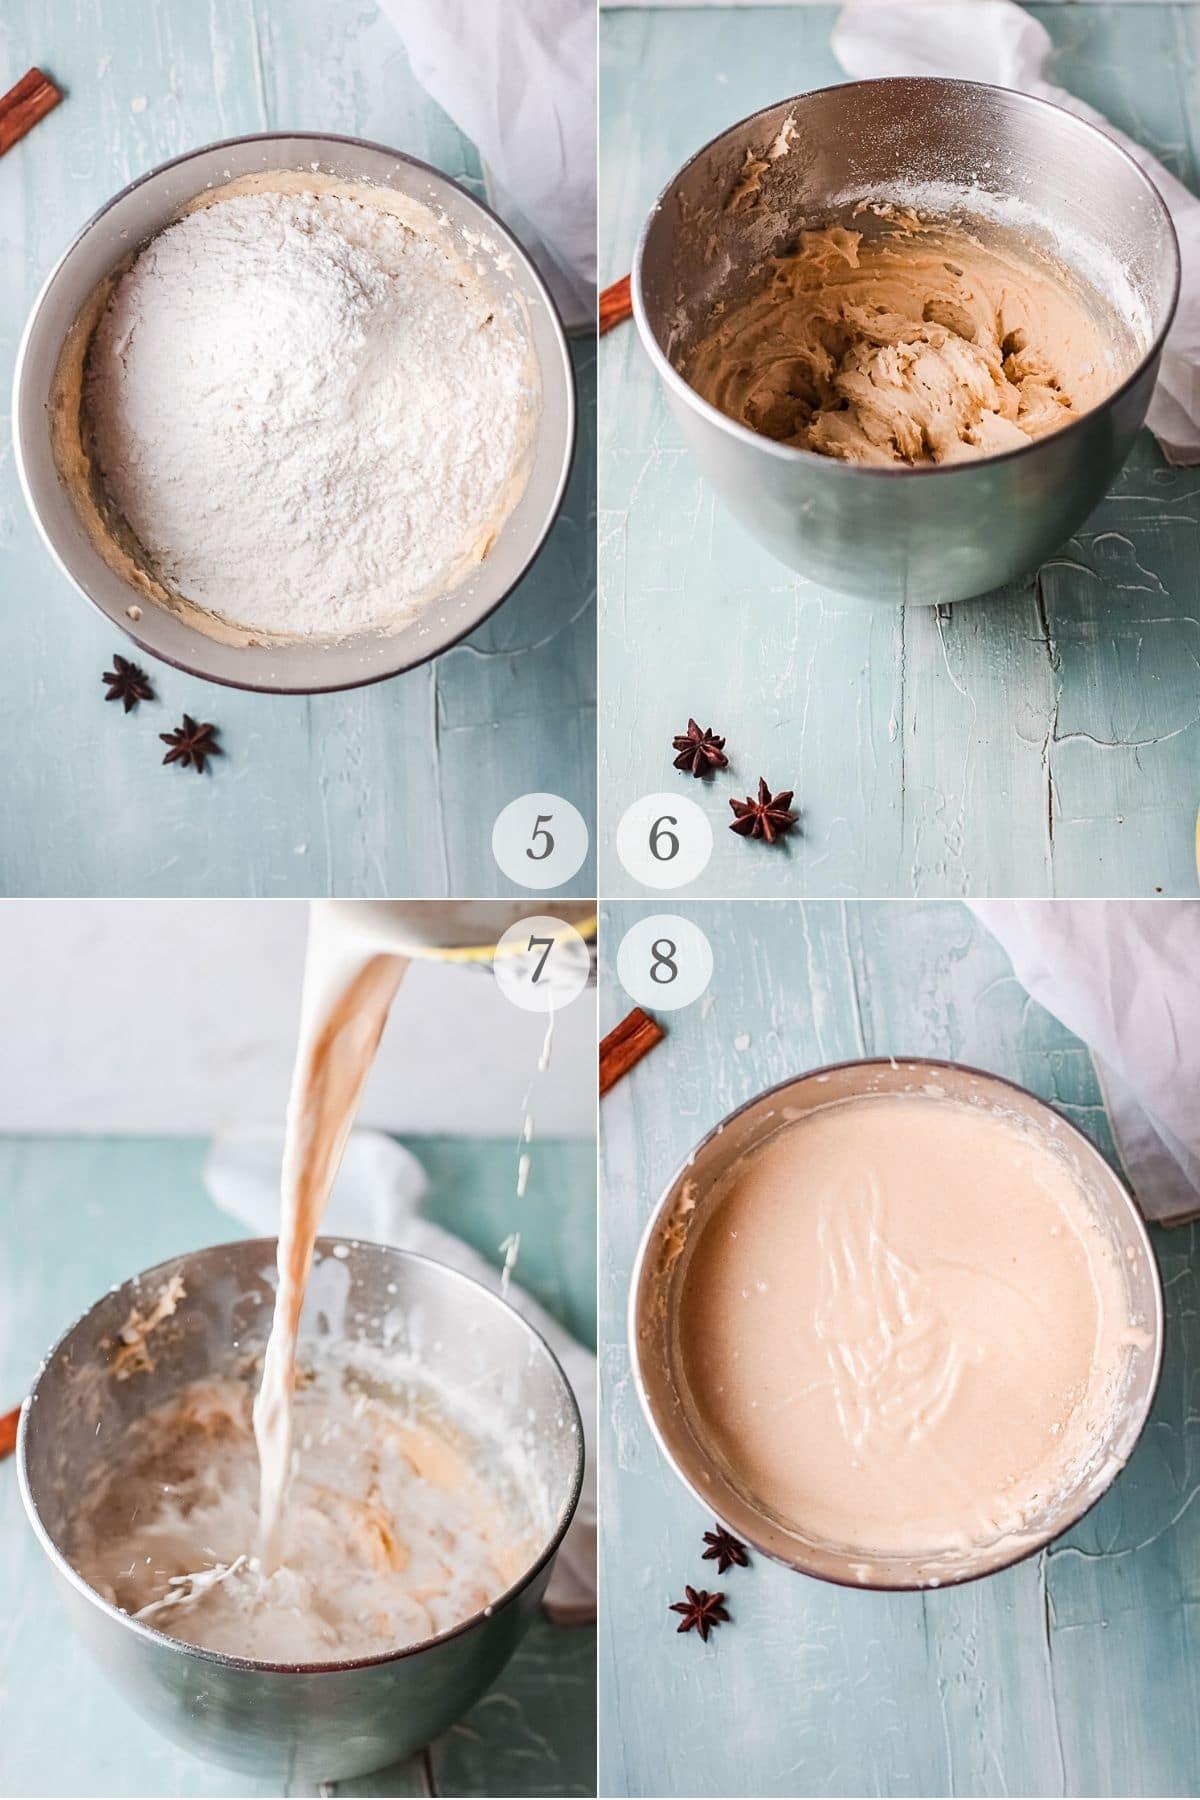 easy coffee cake recipes steps 5-8